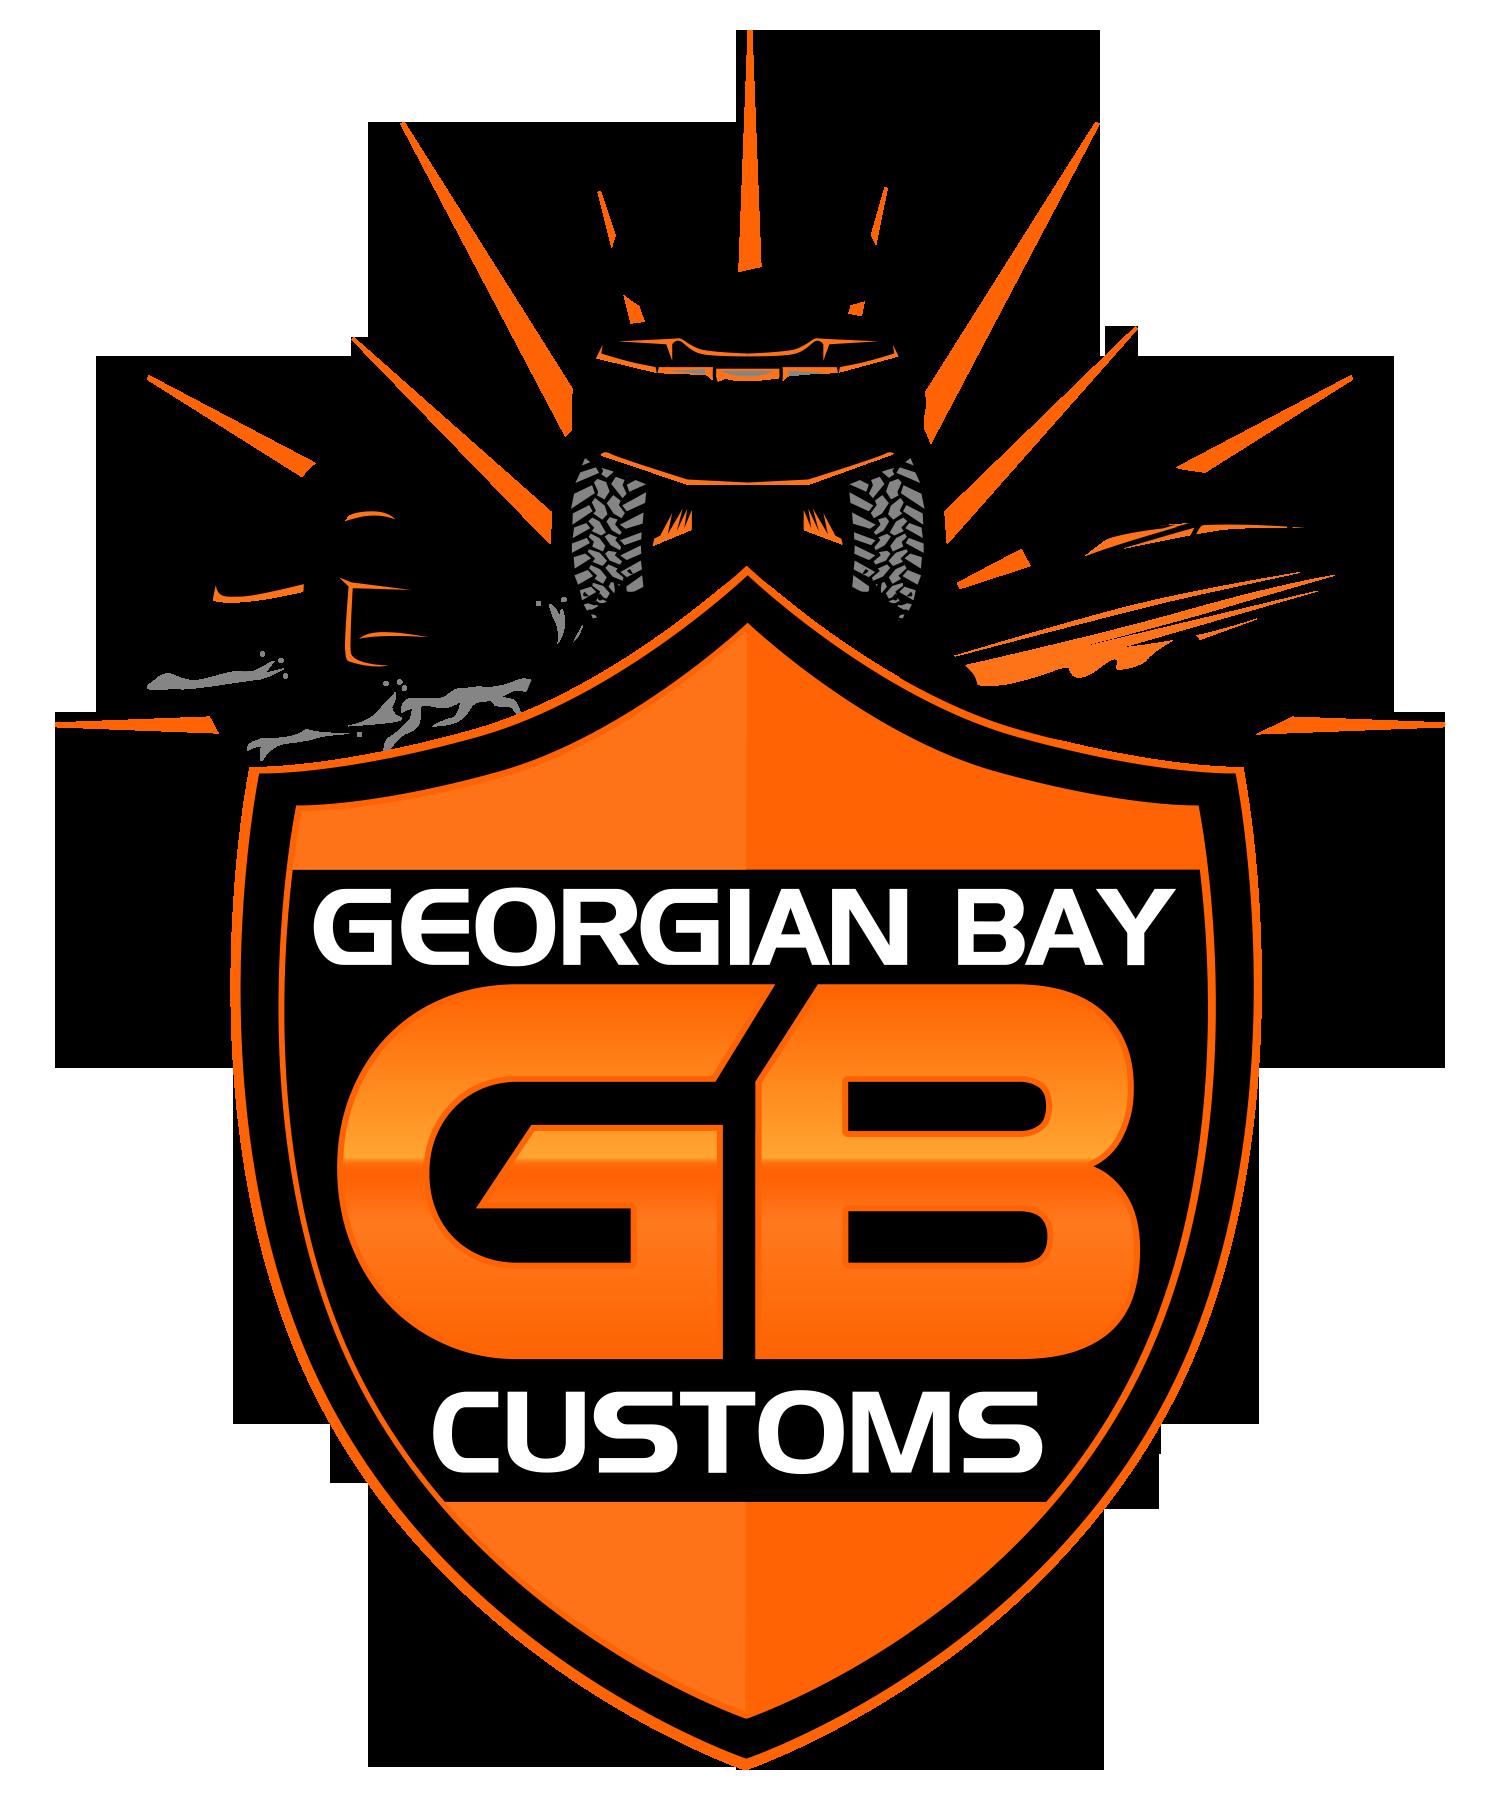 GB Customs needs an eye-catching, unforgettable logo